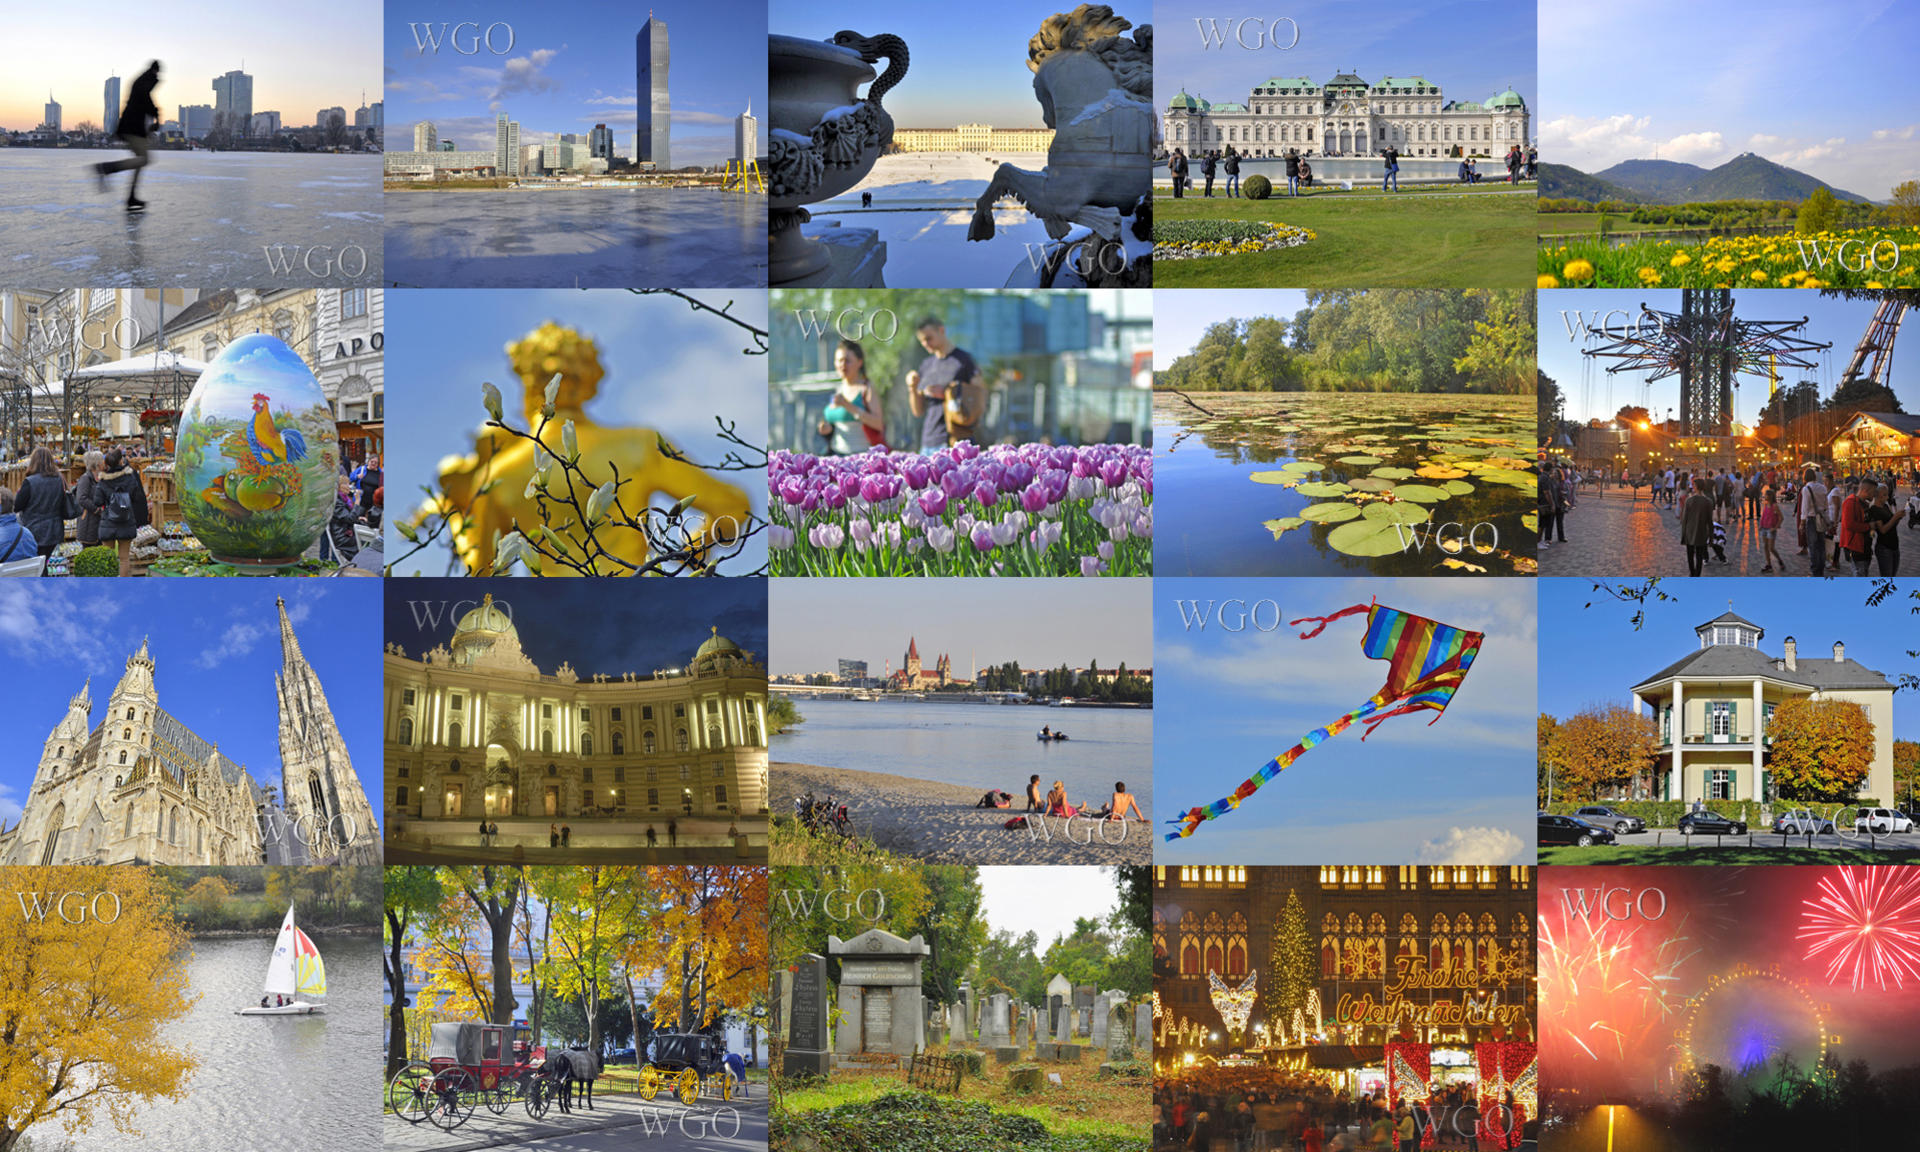 Foto-Tour durch Wien